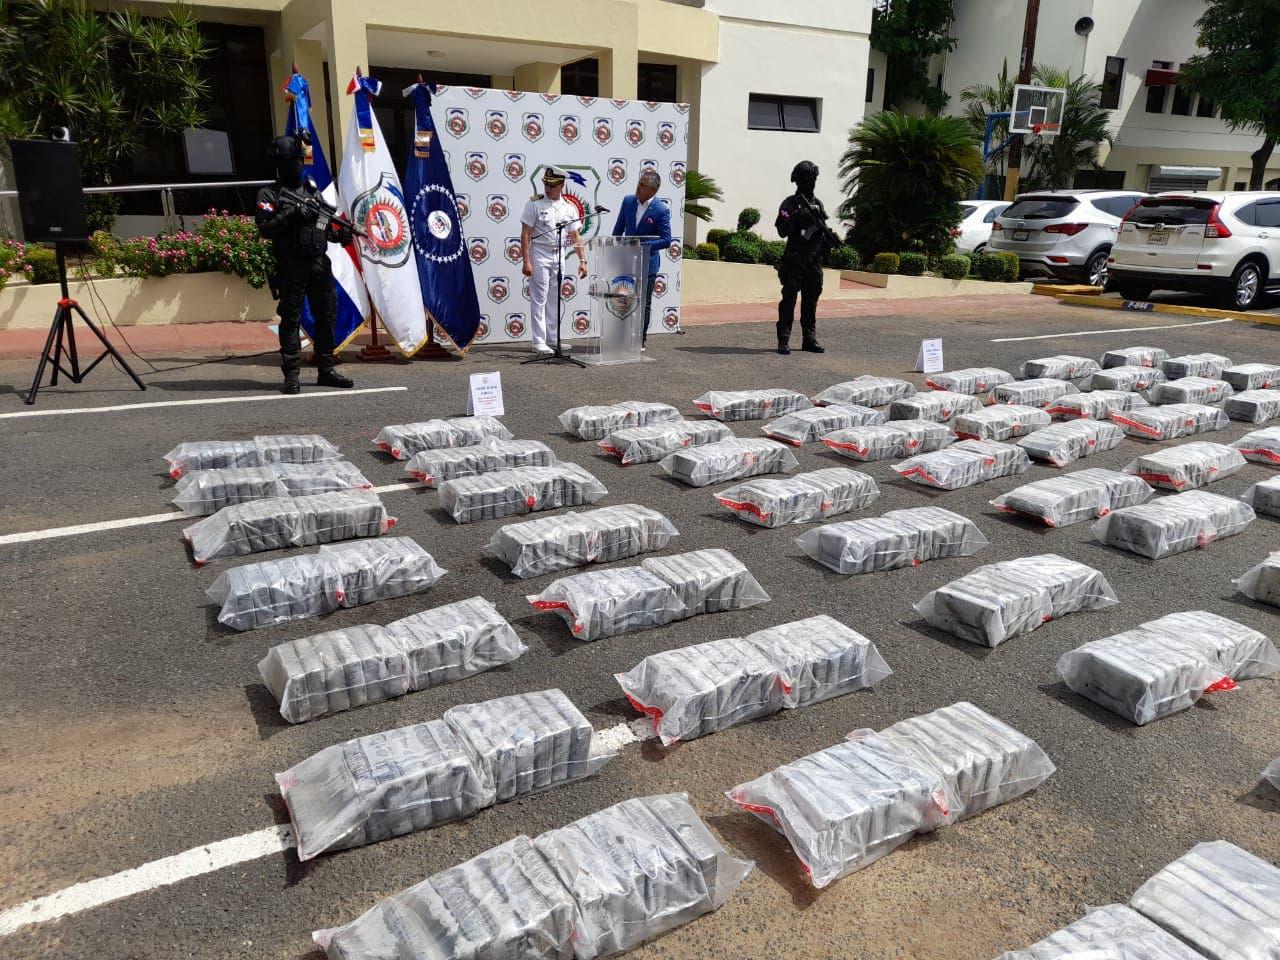 DNCD se incautó 900 paquetes de cocaína próxima a la playa de Boca Chica